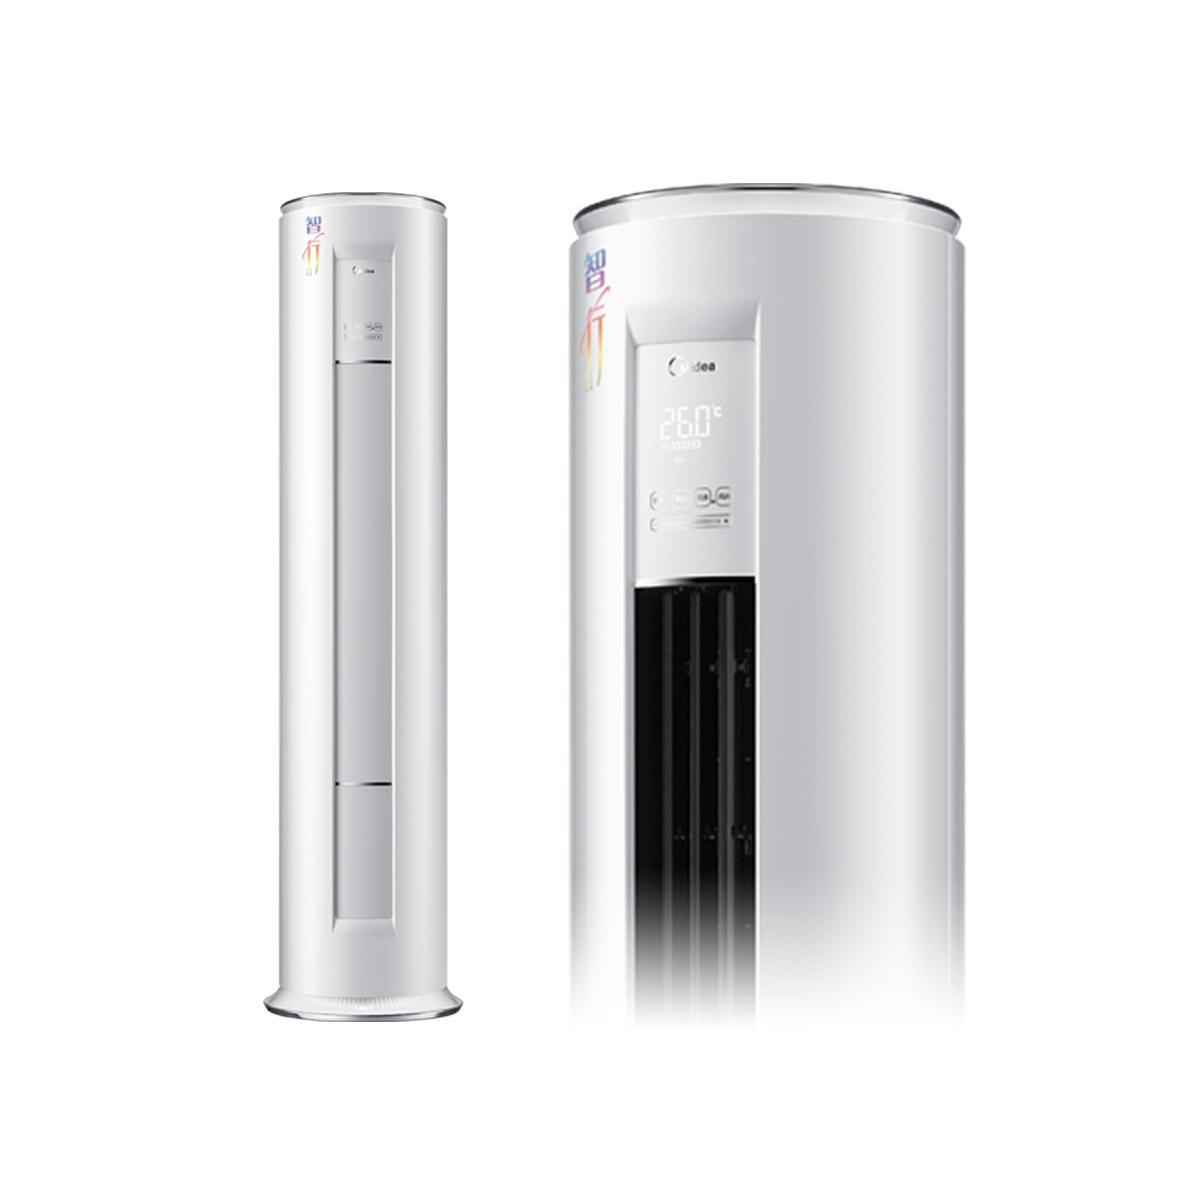 Midea/美的 KFR-72LW/BP3DN8Y-YA401(1)家用空调套机 说明书.pdf